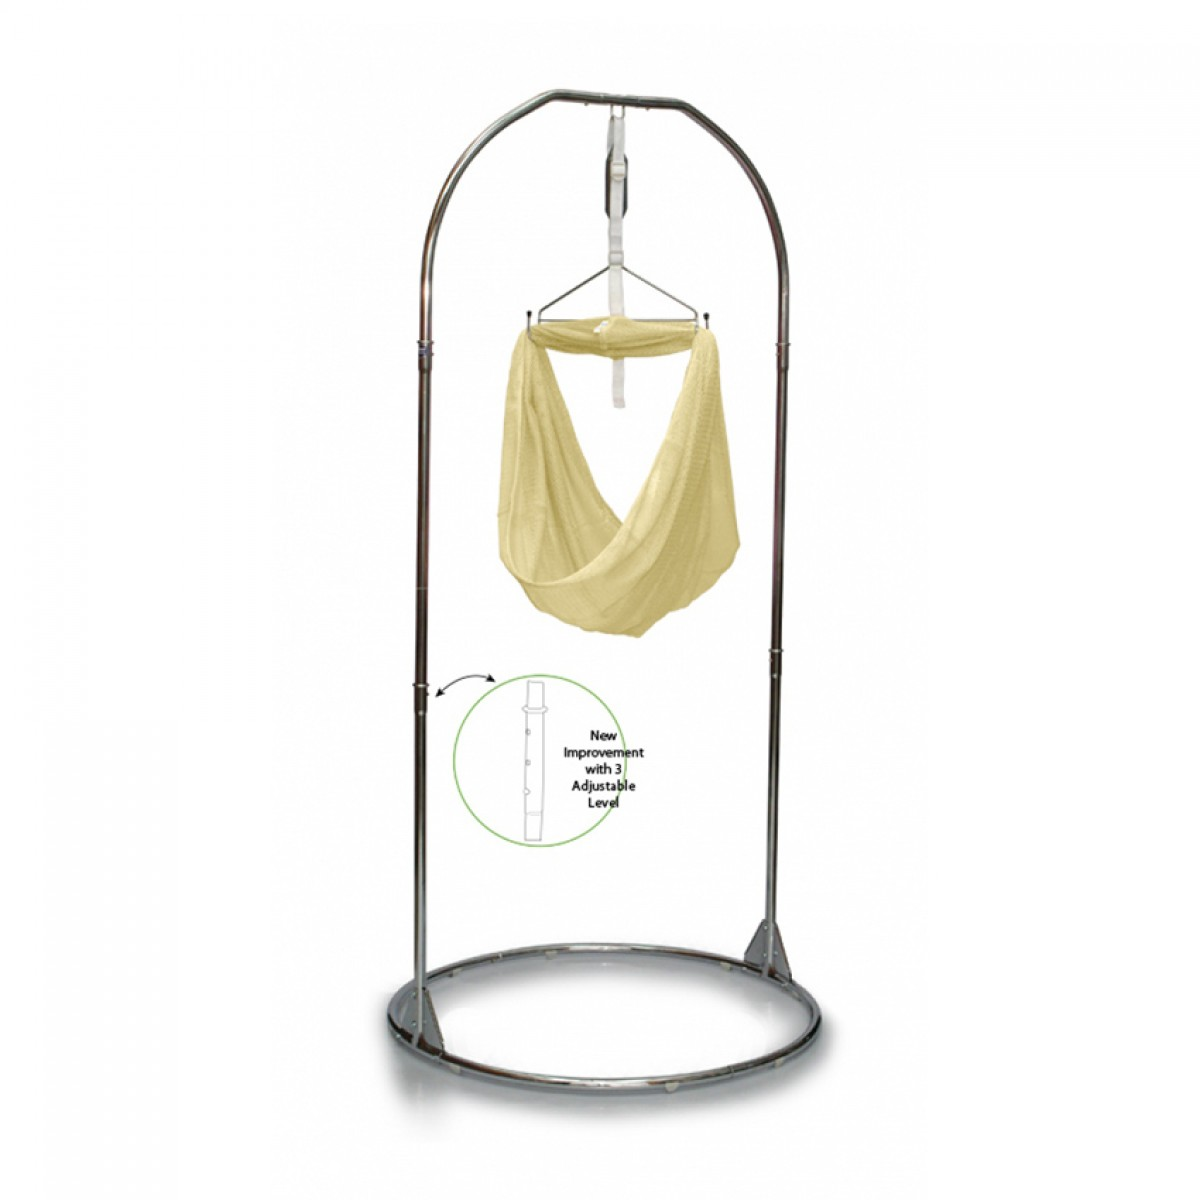 GUVI BABY SPRING COT (CHROME) - Kico Baby Center